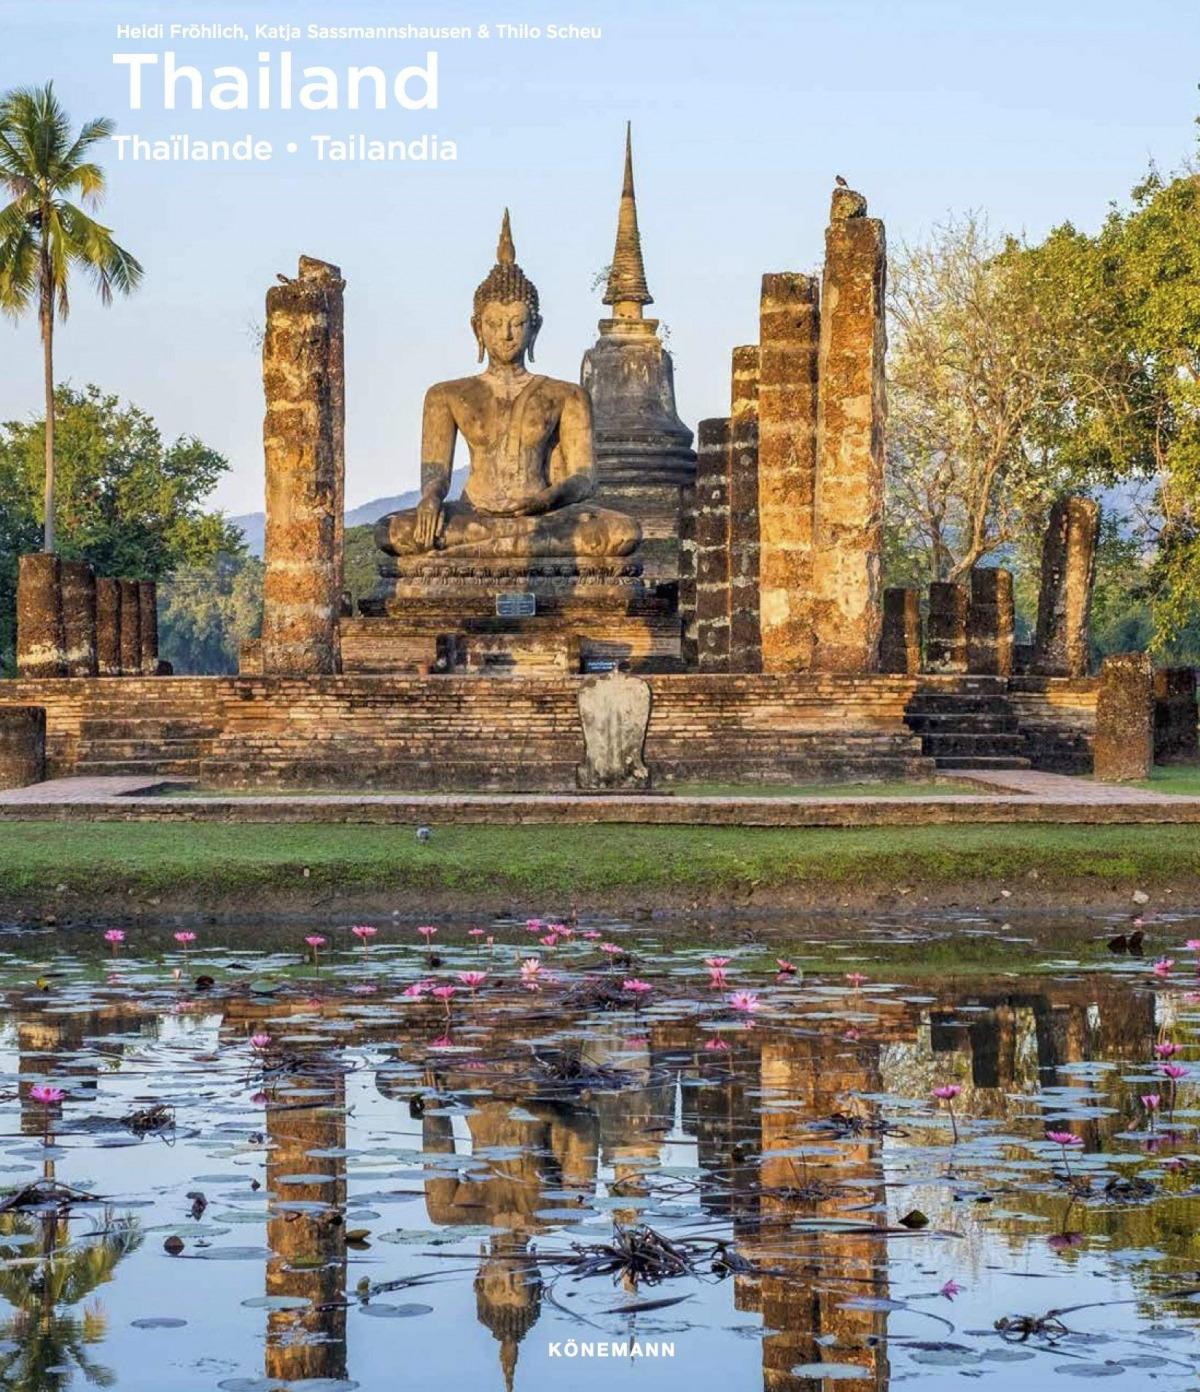 THAILAND / THAILANDE / TAILANDIA 9783741920288